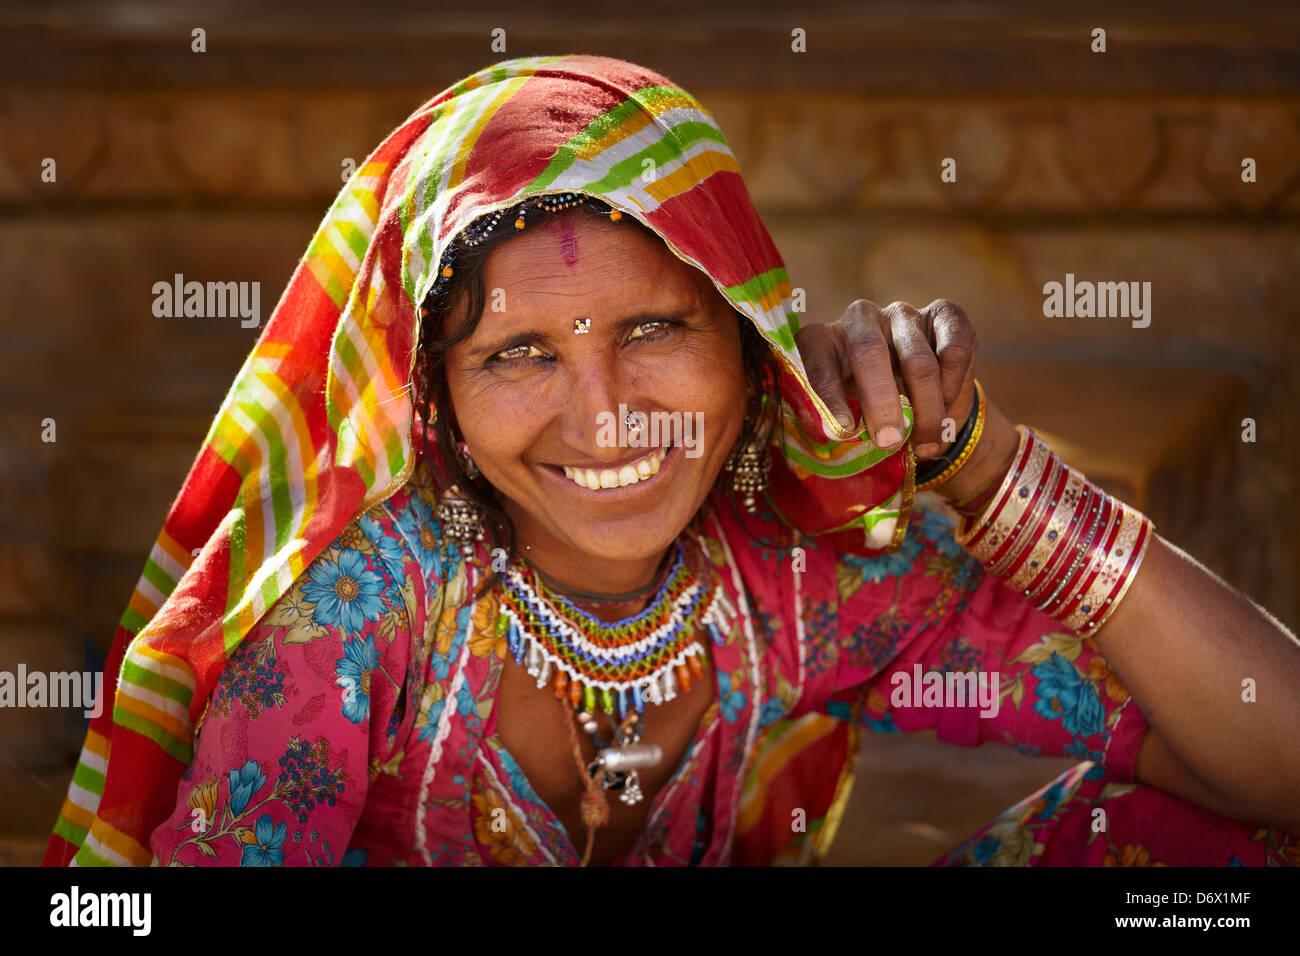 Portrait of smiling woman l'Inde, Jaisalmer, Rajasthan, India Banque D'Images